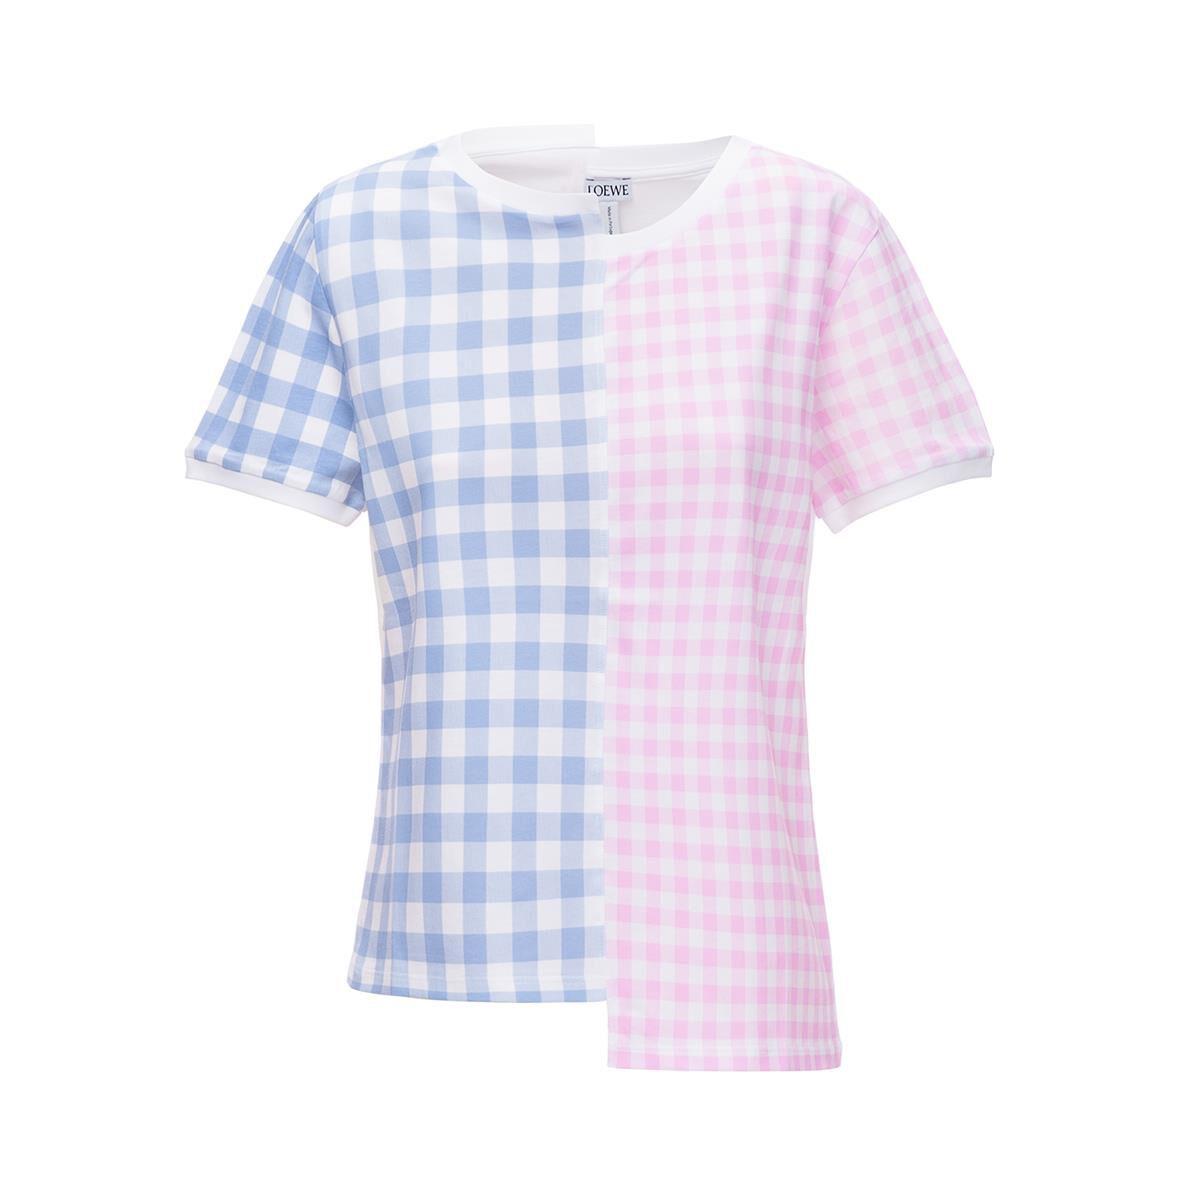 LOEWE Gingham Loewe T-Shirt Pink/Blue all